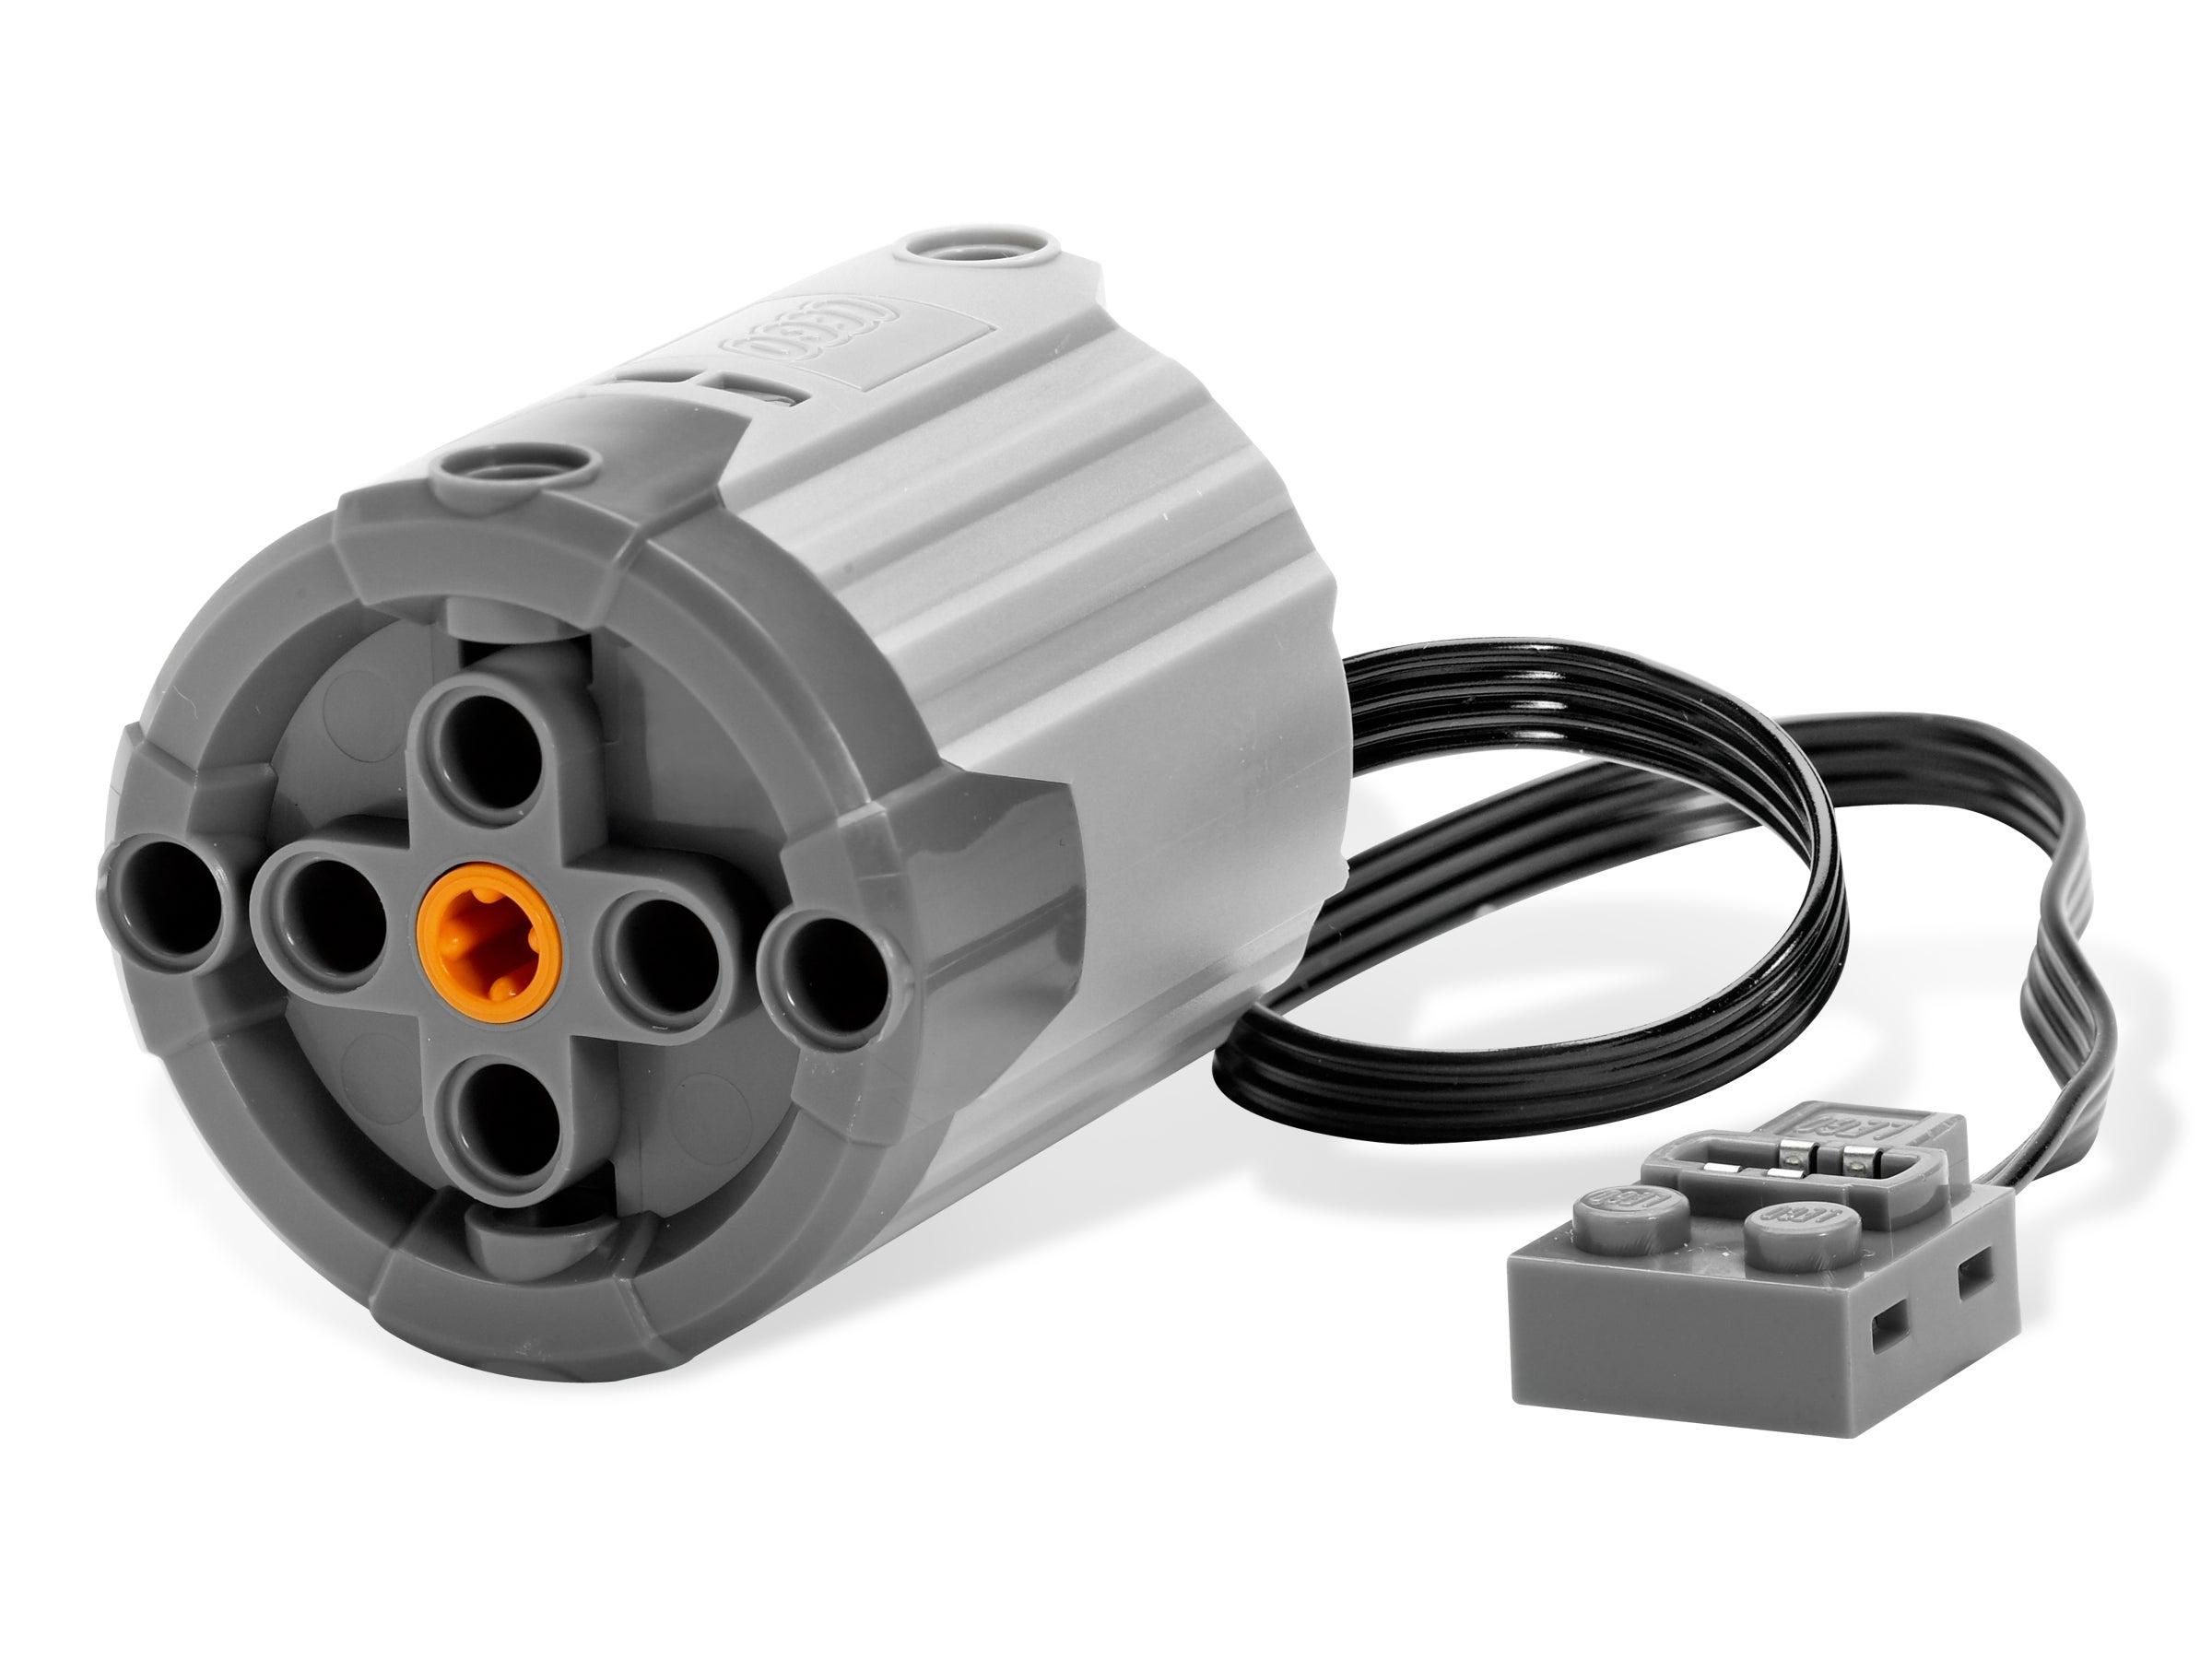 LEGO Technic Power Funktions XL Motor 8882 z.b für 10194 TOP Neuware OVP 6129430